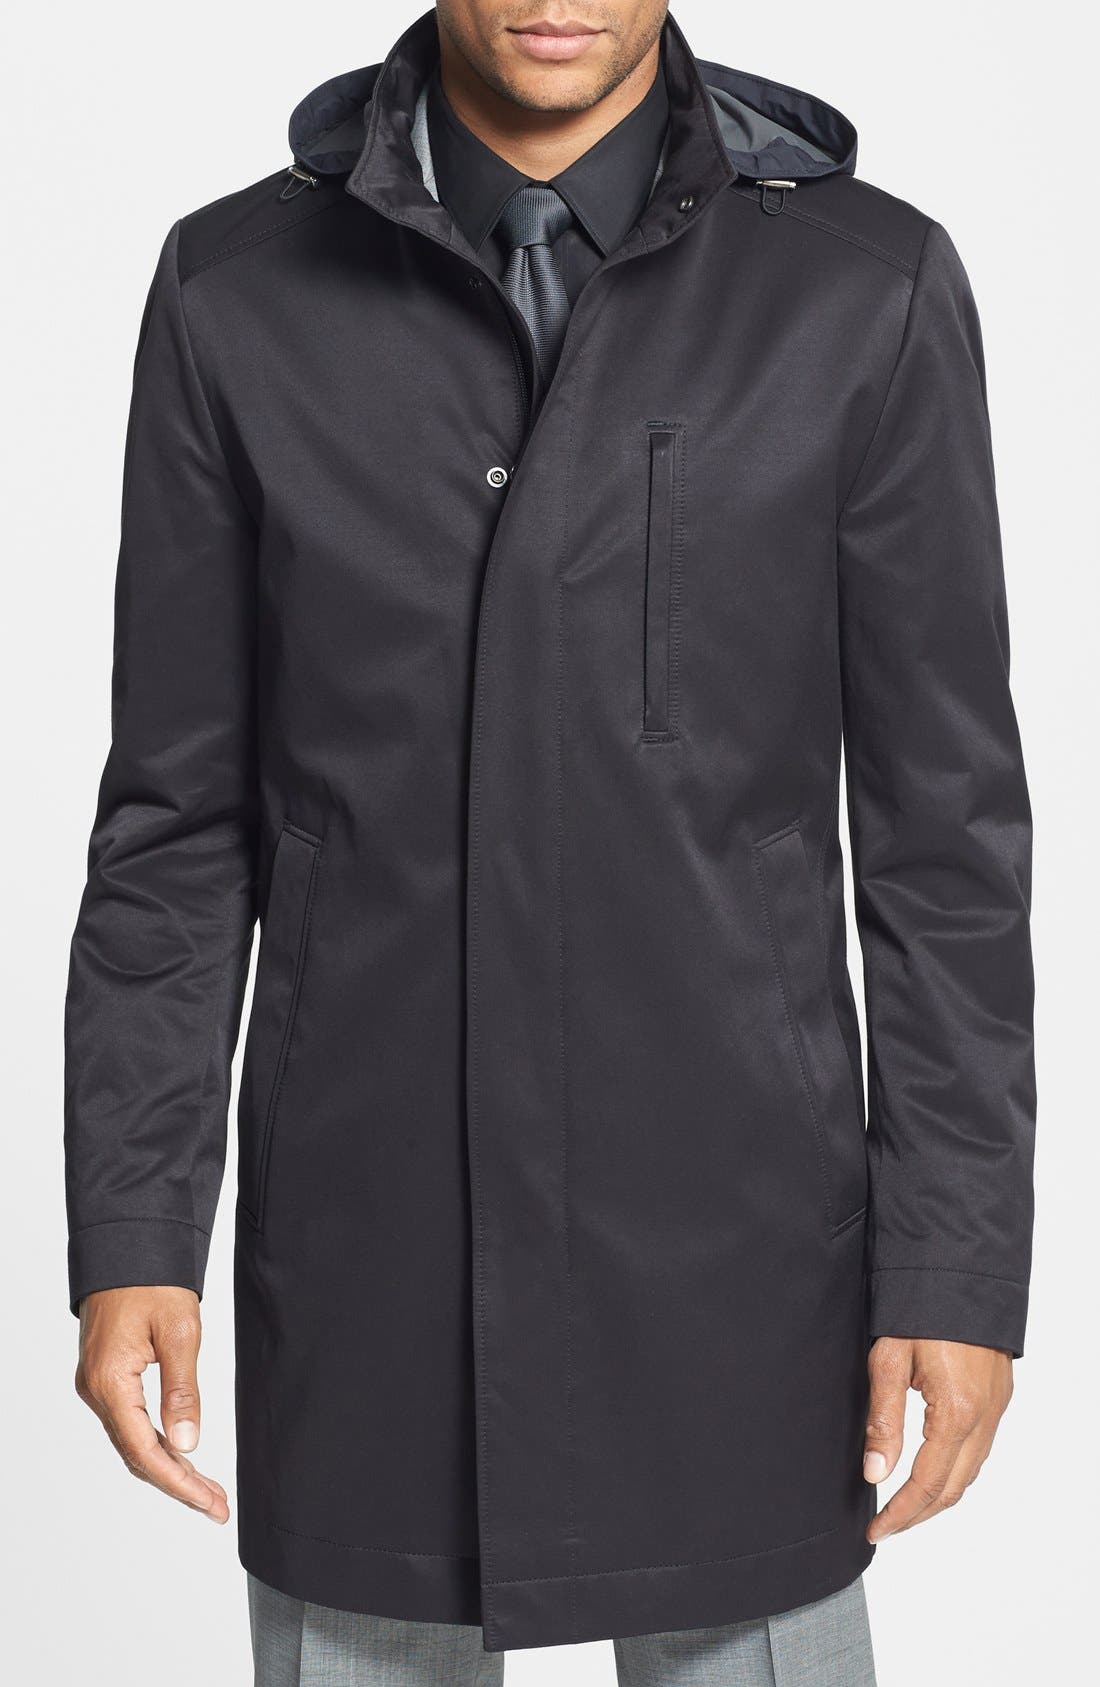 BOSS 'The Donal' Trim Fit Raincoat,                         Main,                         color, Black